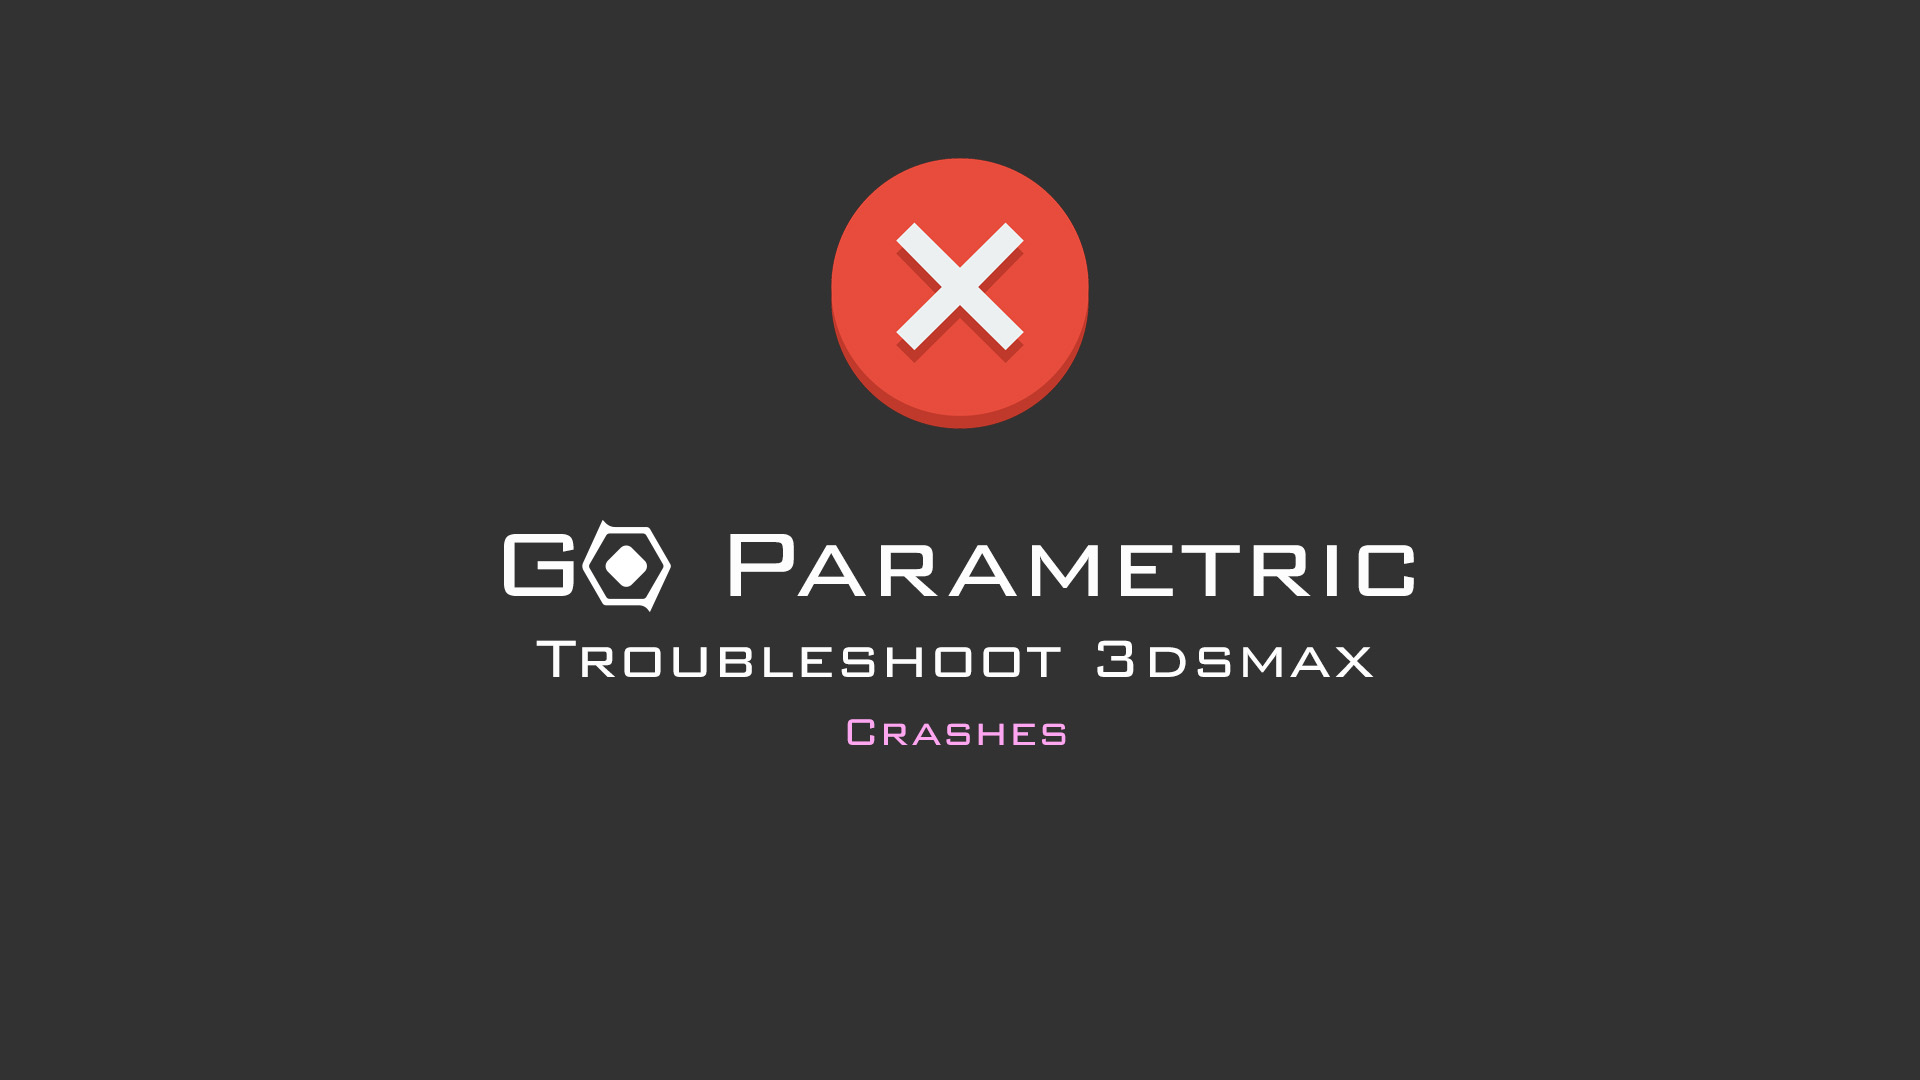 Go Parametric_Troubleshoot_3dsmax.jpg